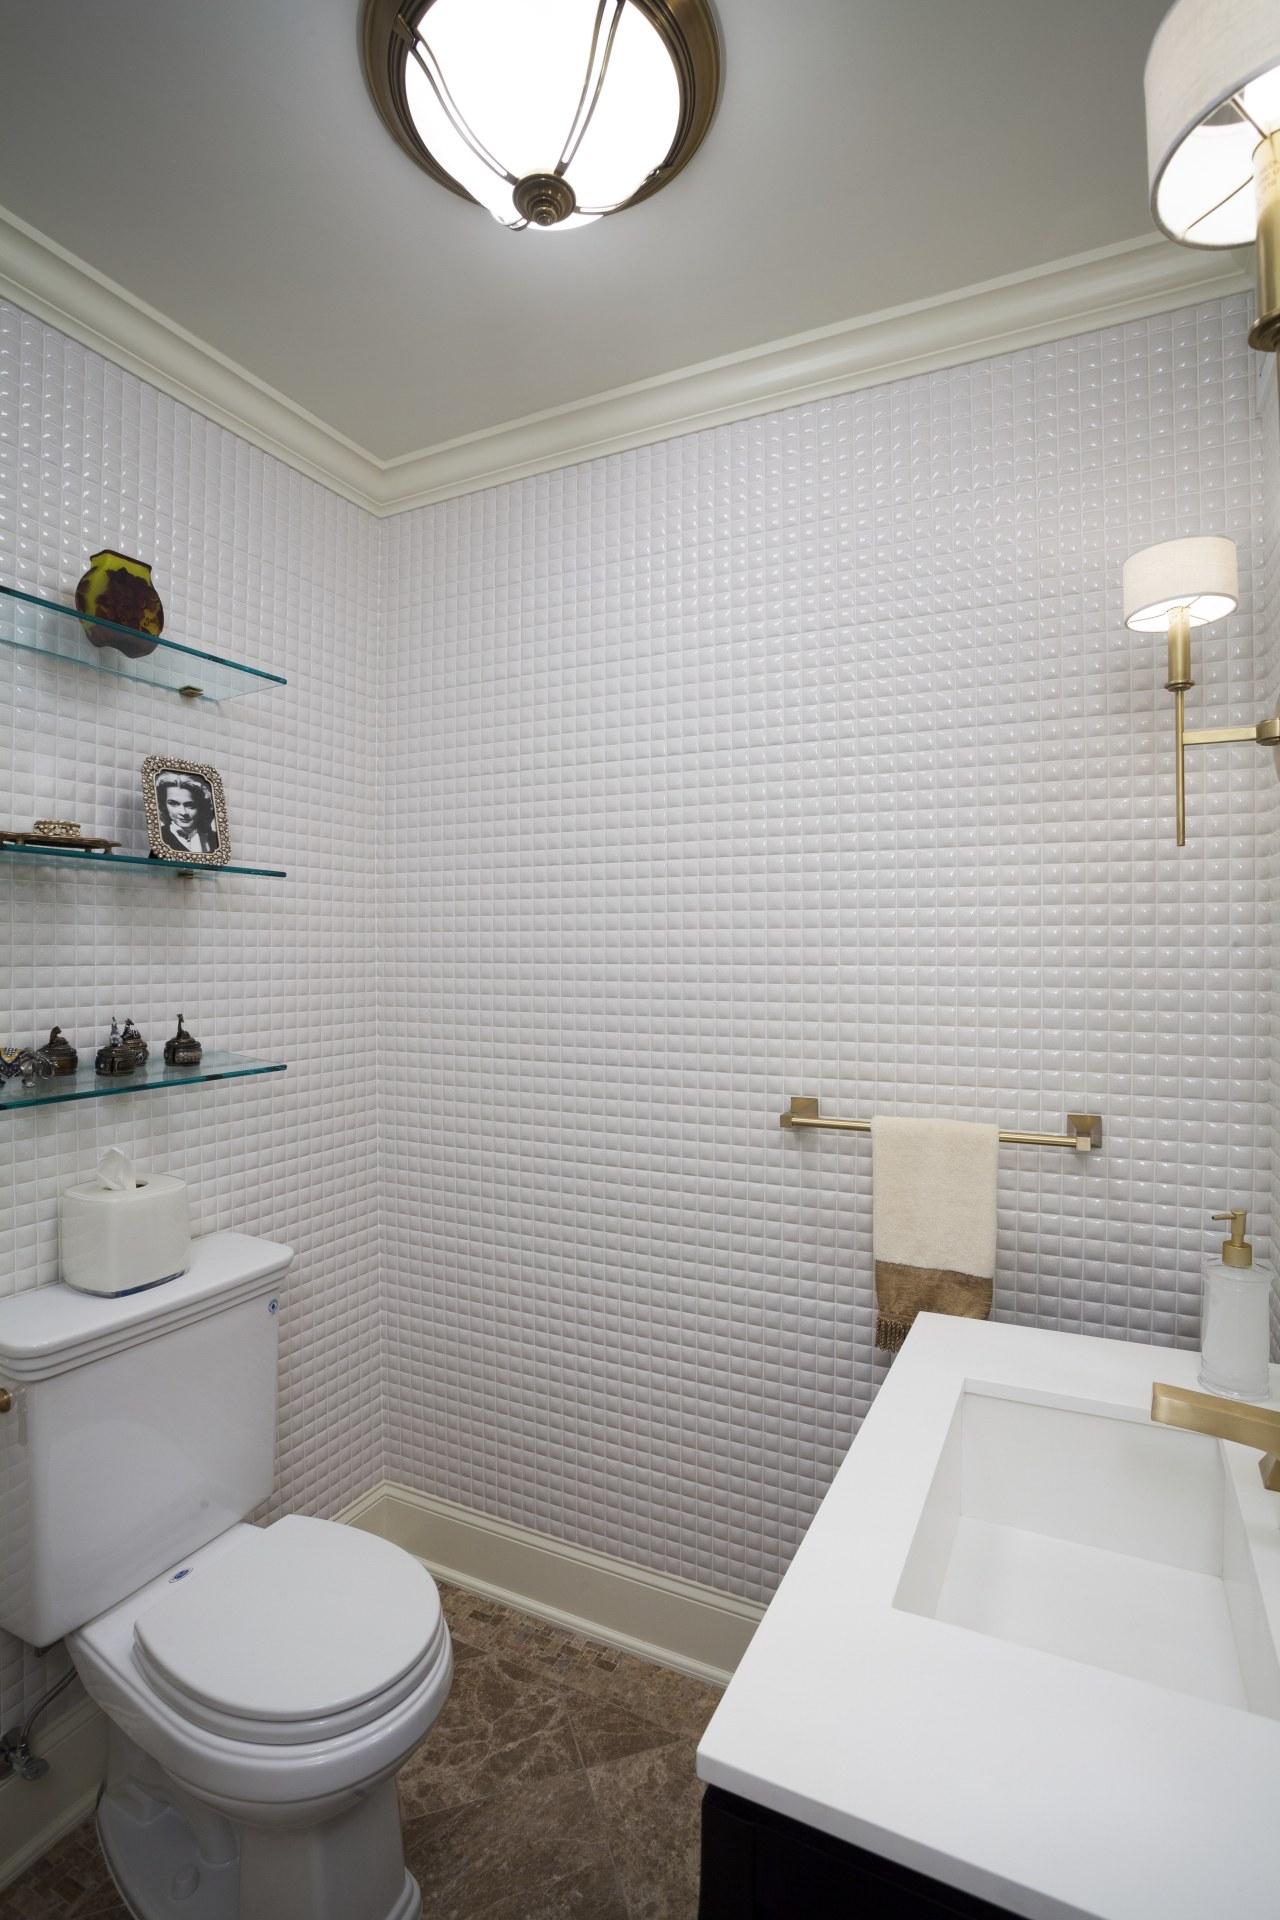 Brown-toned Lite Emperador marble floor tiles were laid bathroom, bathroom accessory, ceiling, daylighting, floor, home, house, interior design, plumbing fixture, room, sink, tap, tile, wall, gray